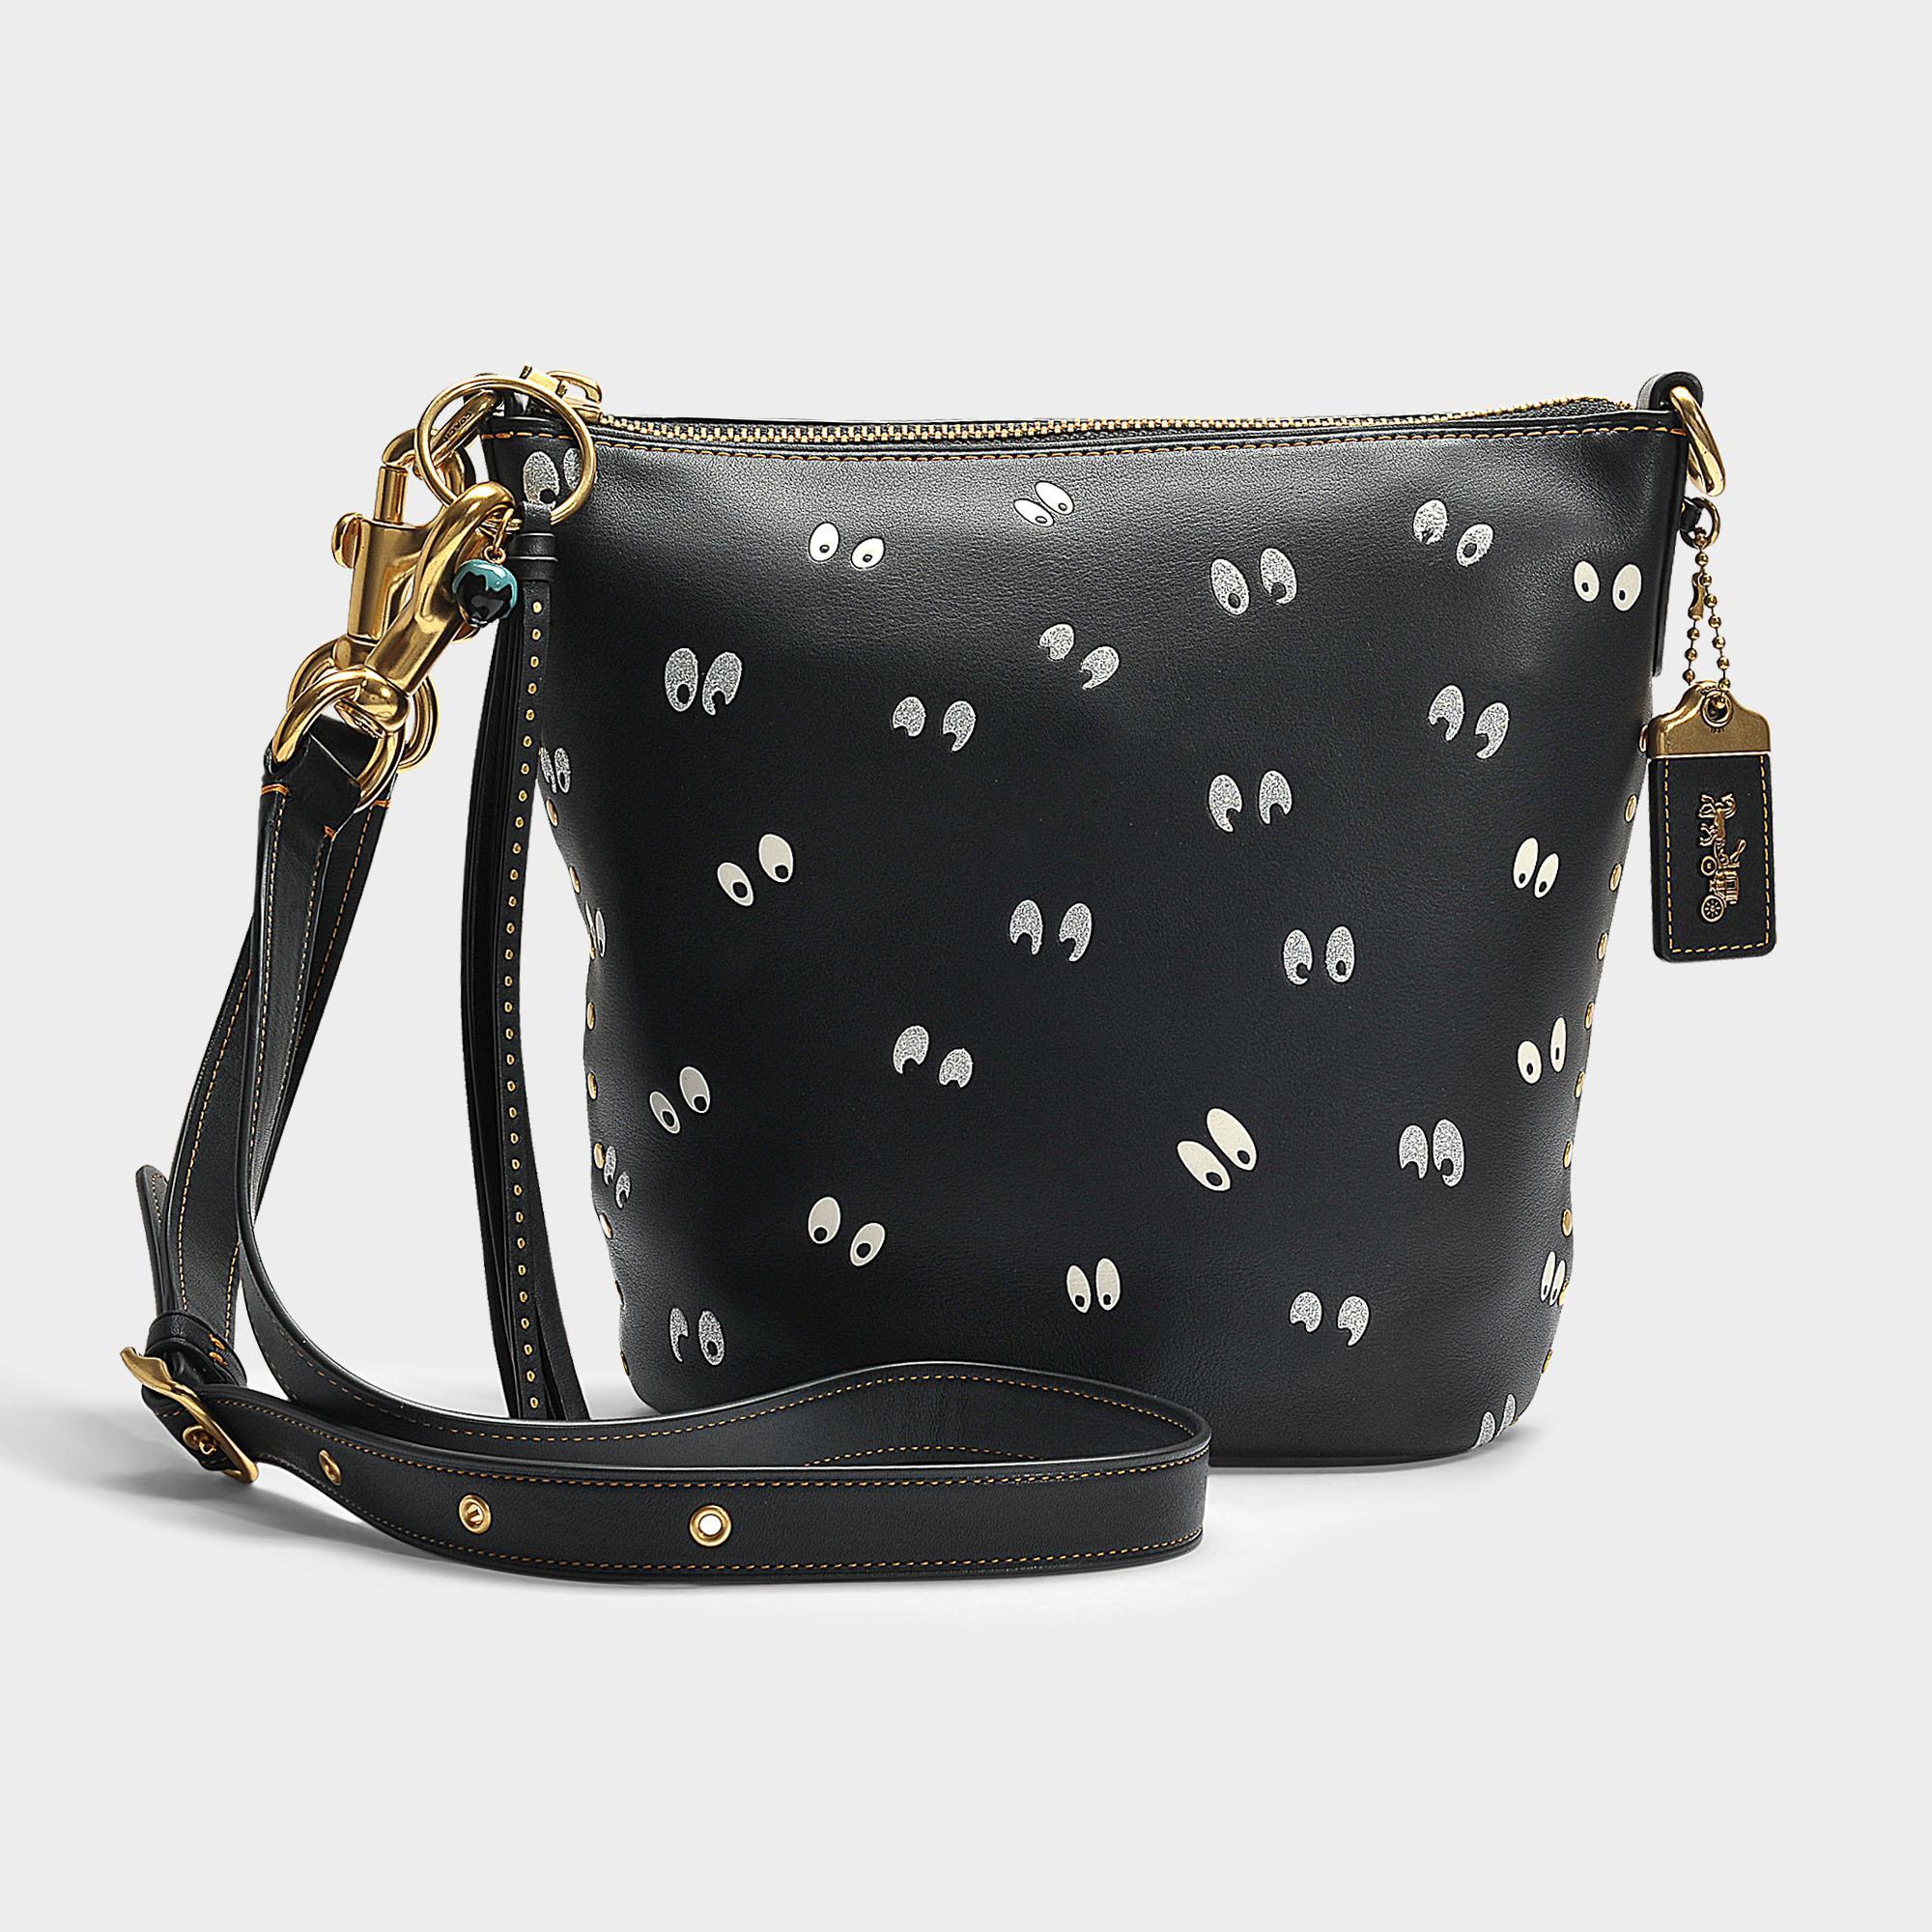 Coach Spooky Eyes Print Duffle 20 Bag In Black Calfskin Lyst